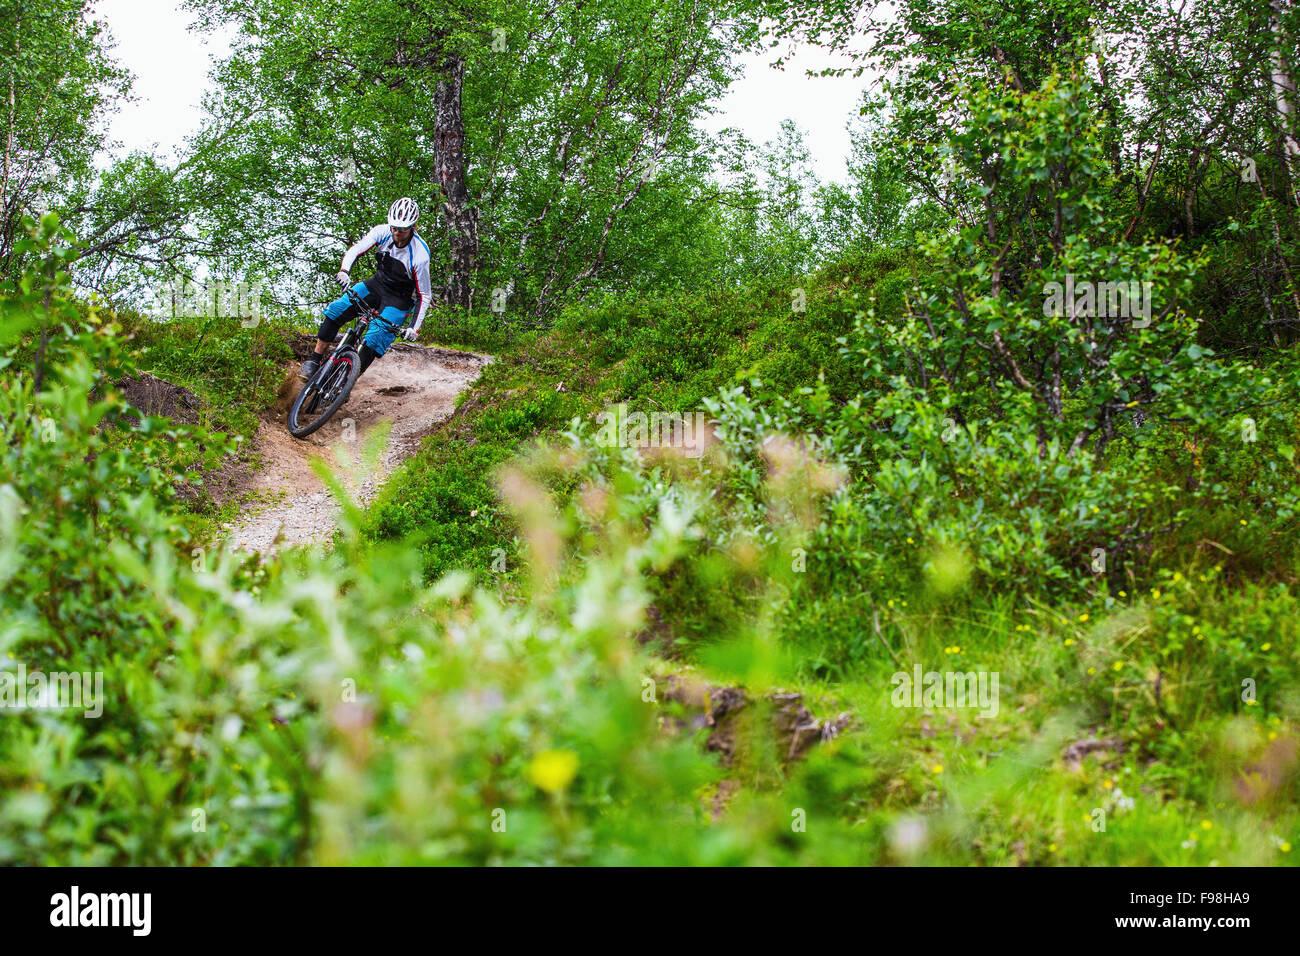 Mountain biker tackles a corner in Valadalen, Sweden. - Stock Image